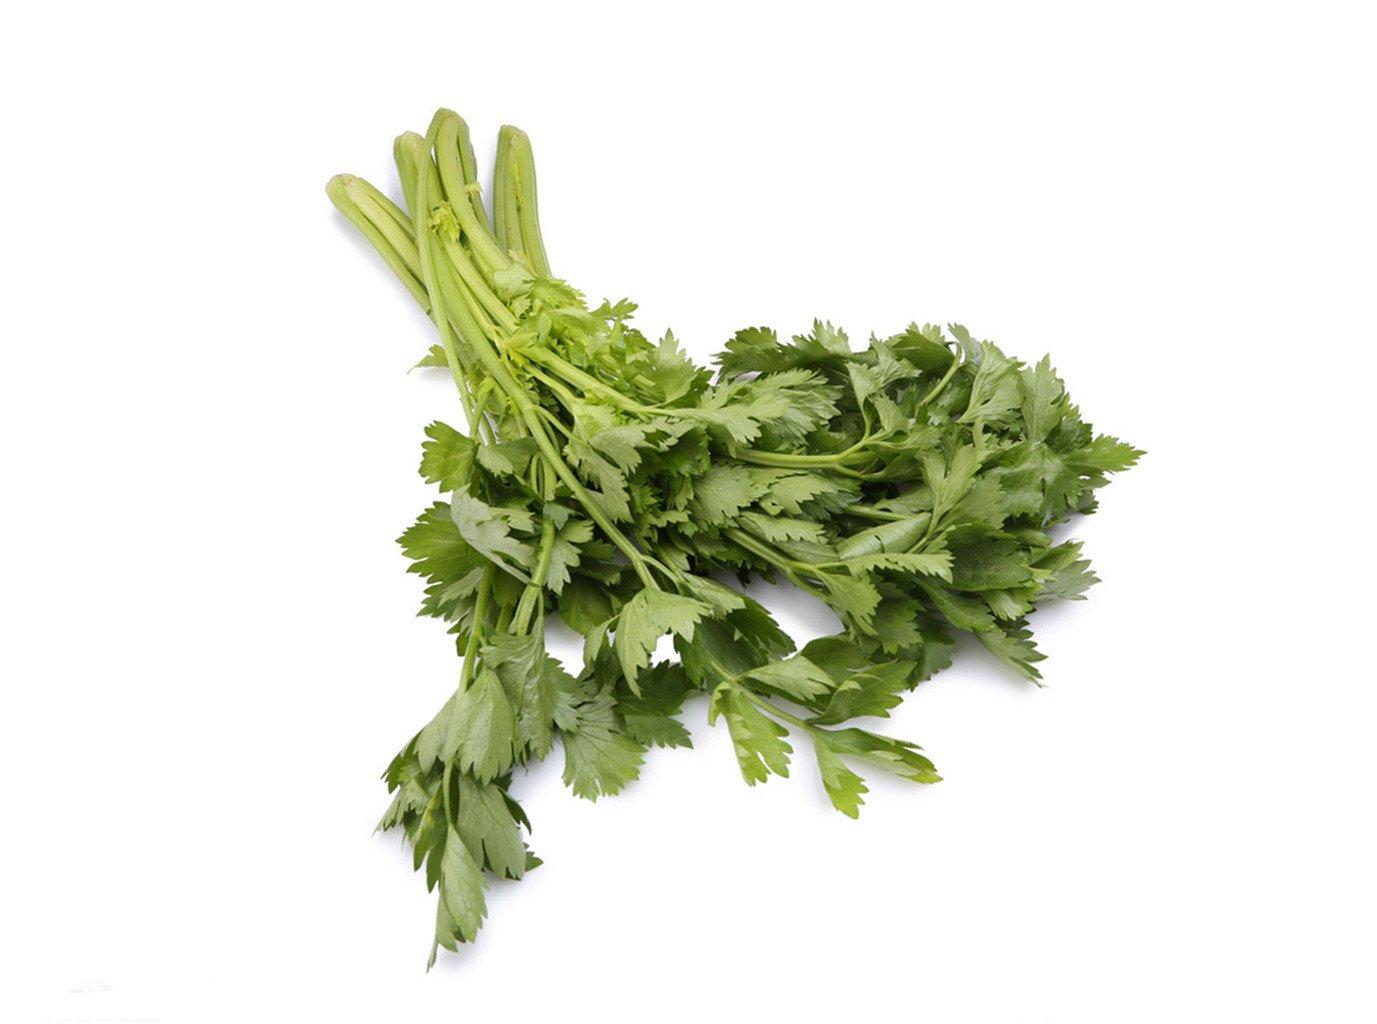 300 Chinese Celery Celery drugs Green Organic Vegetable Seeds ~Chris's garden